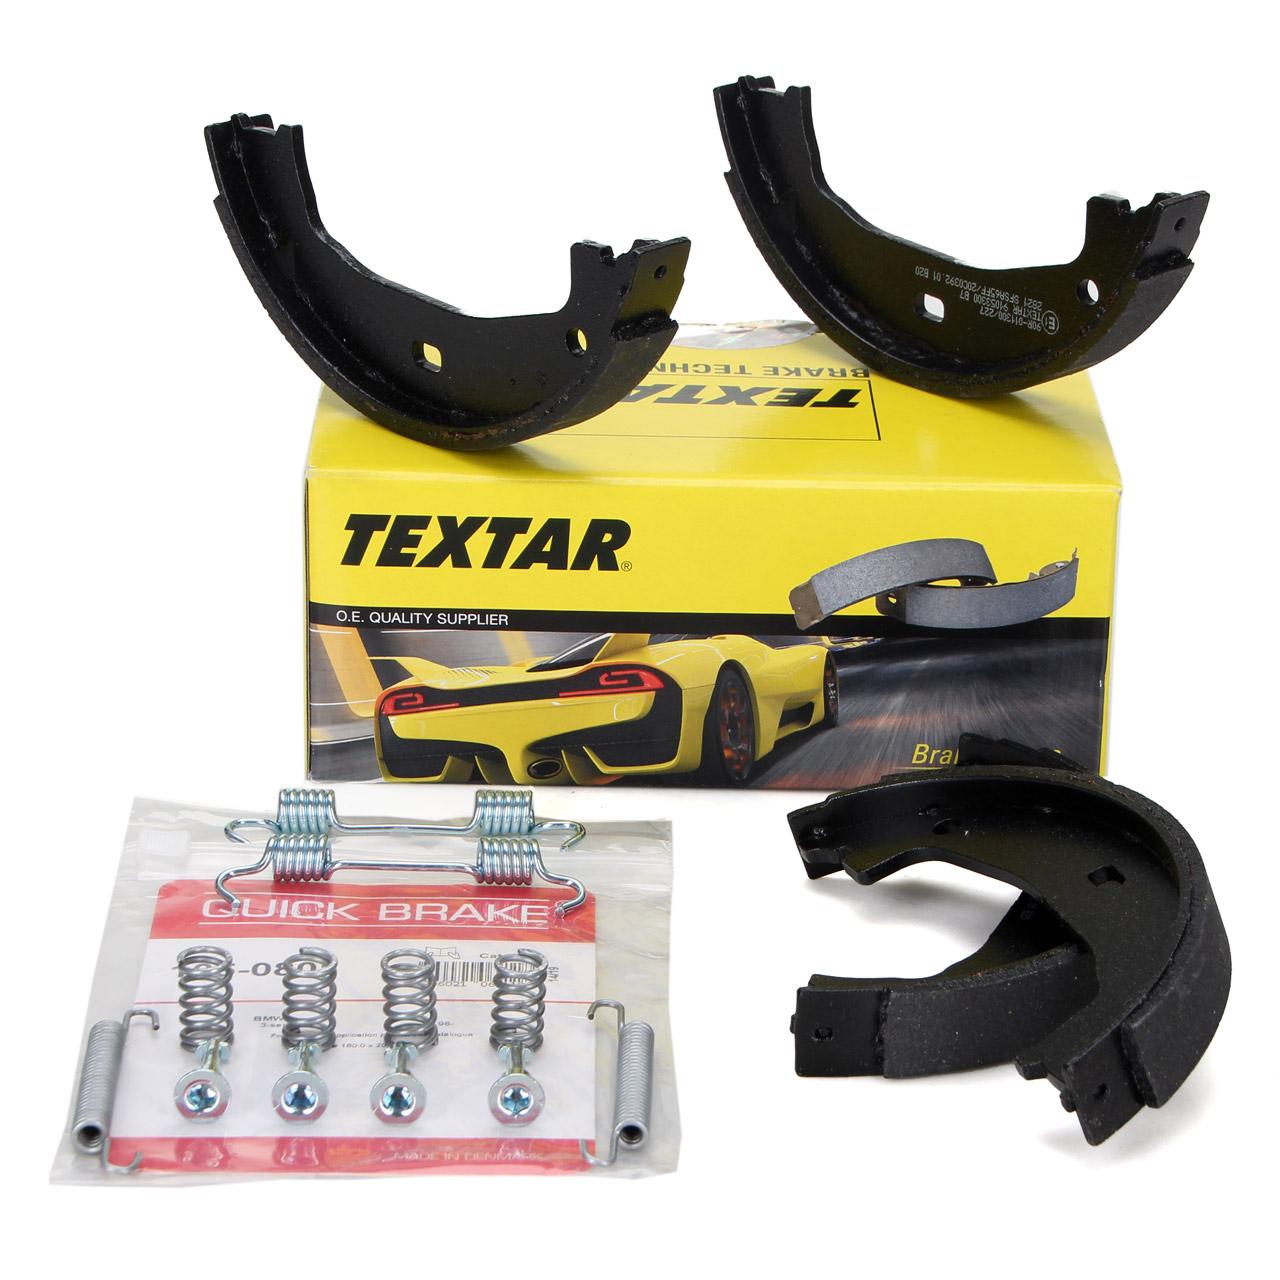 TEXTAR 91053300 Bremsbacken + Federn Satz BMW E81-88 F20 F21 E46 E90-93 F30 F31 F32 F36